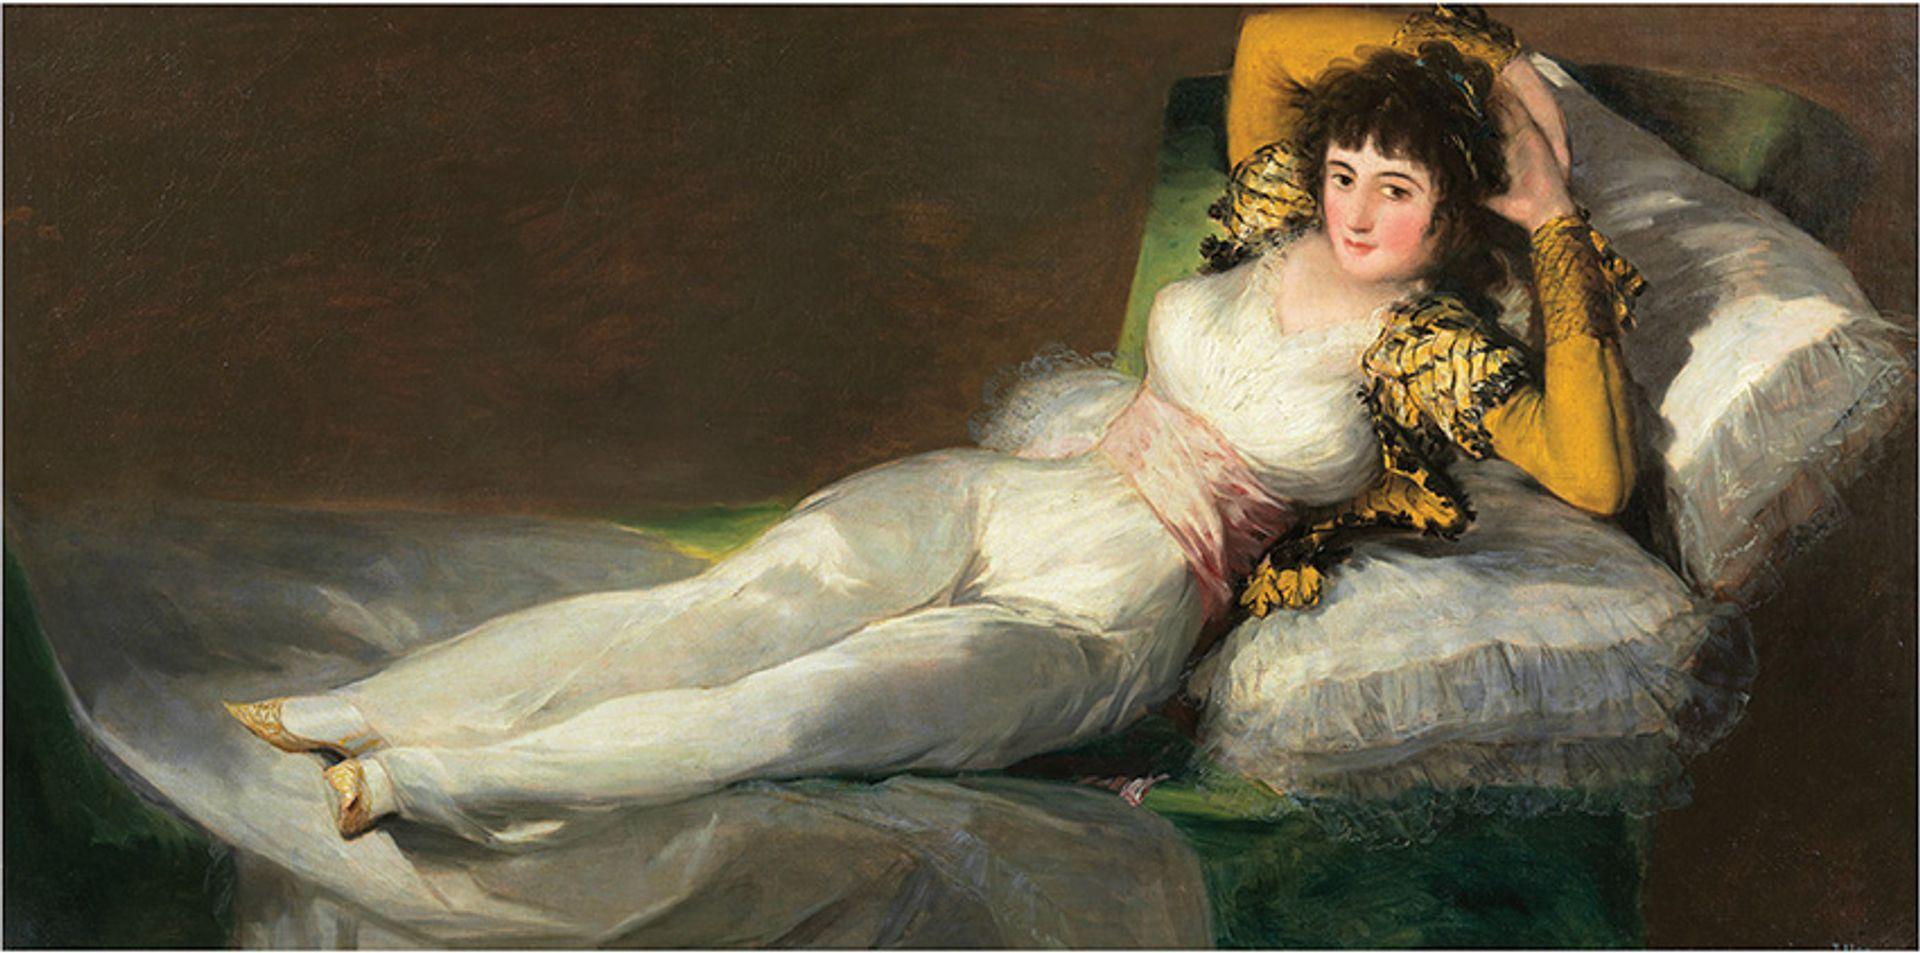 Francisco de Goya's The Clothed Maja (1800-07) will be on show at the Beyeler Image: courtesy of Museo Nacional del Prado